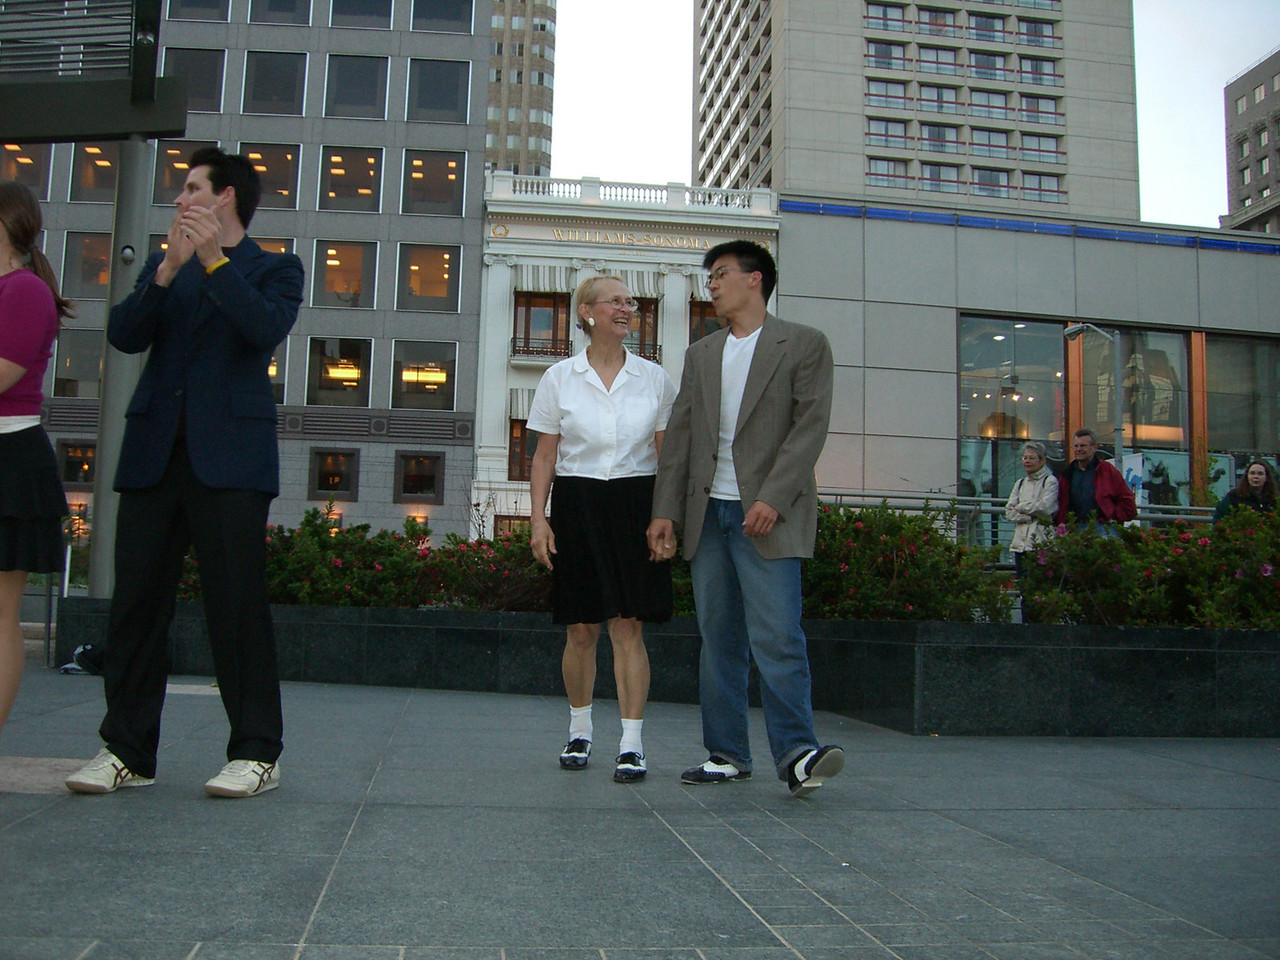 2006 05 03 Wed - Sharon Crocker & Ben Yu after Union Square 'Jam Session' performance 2